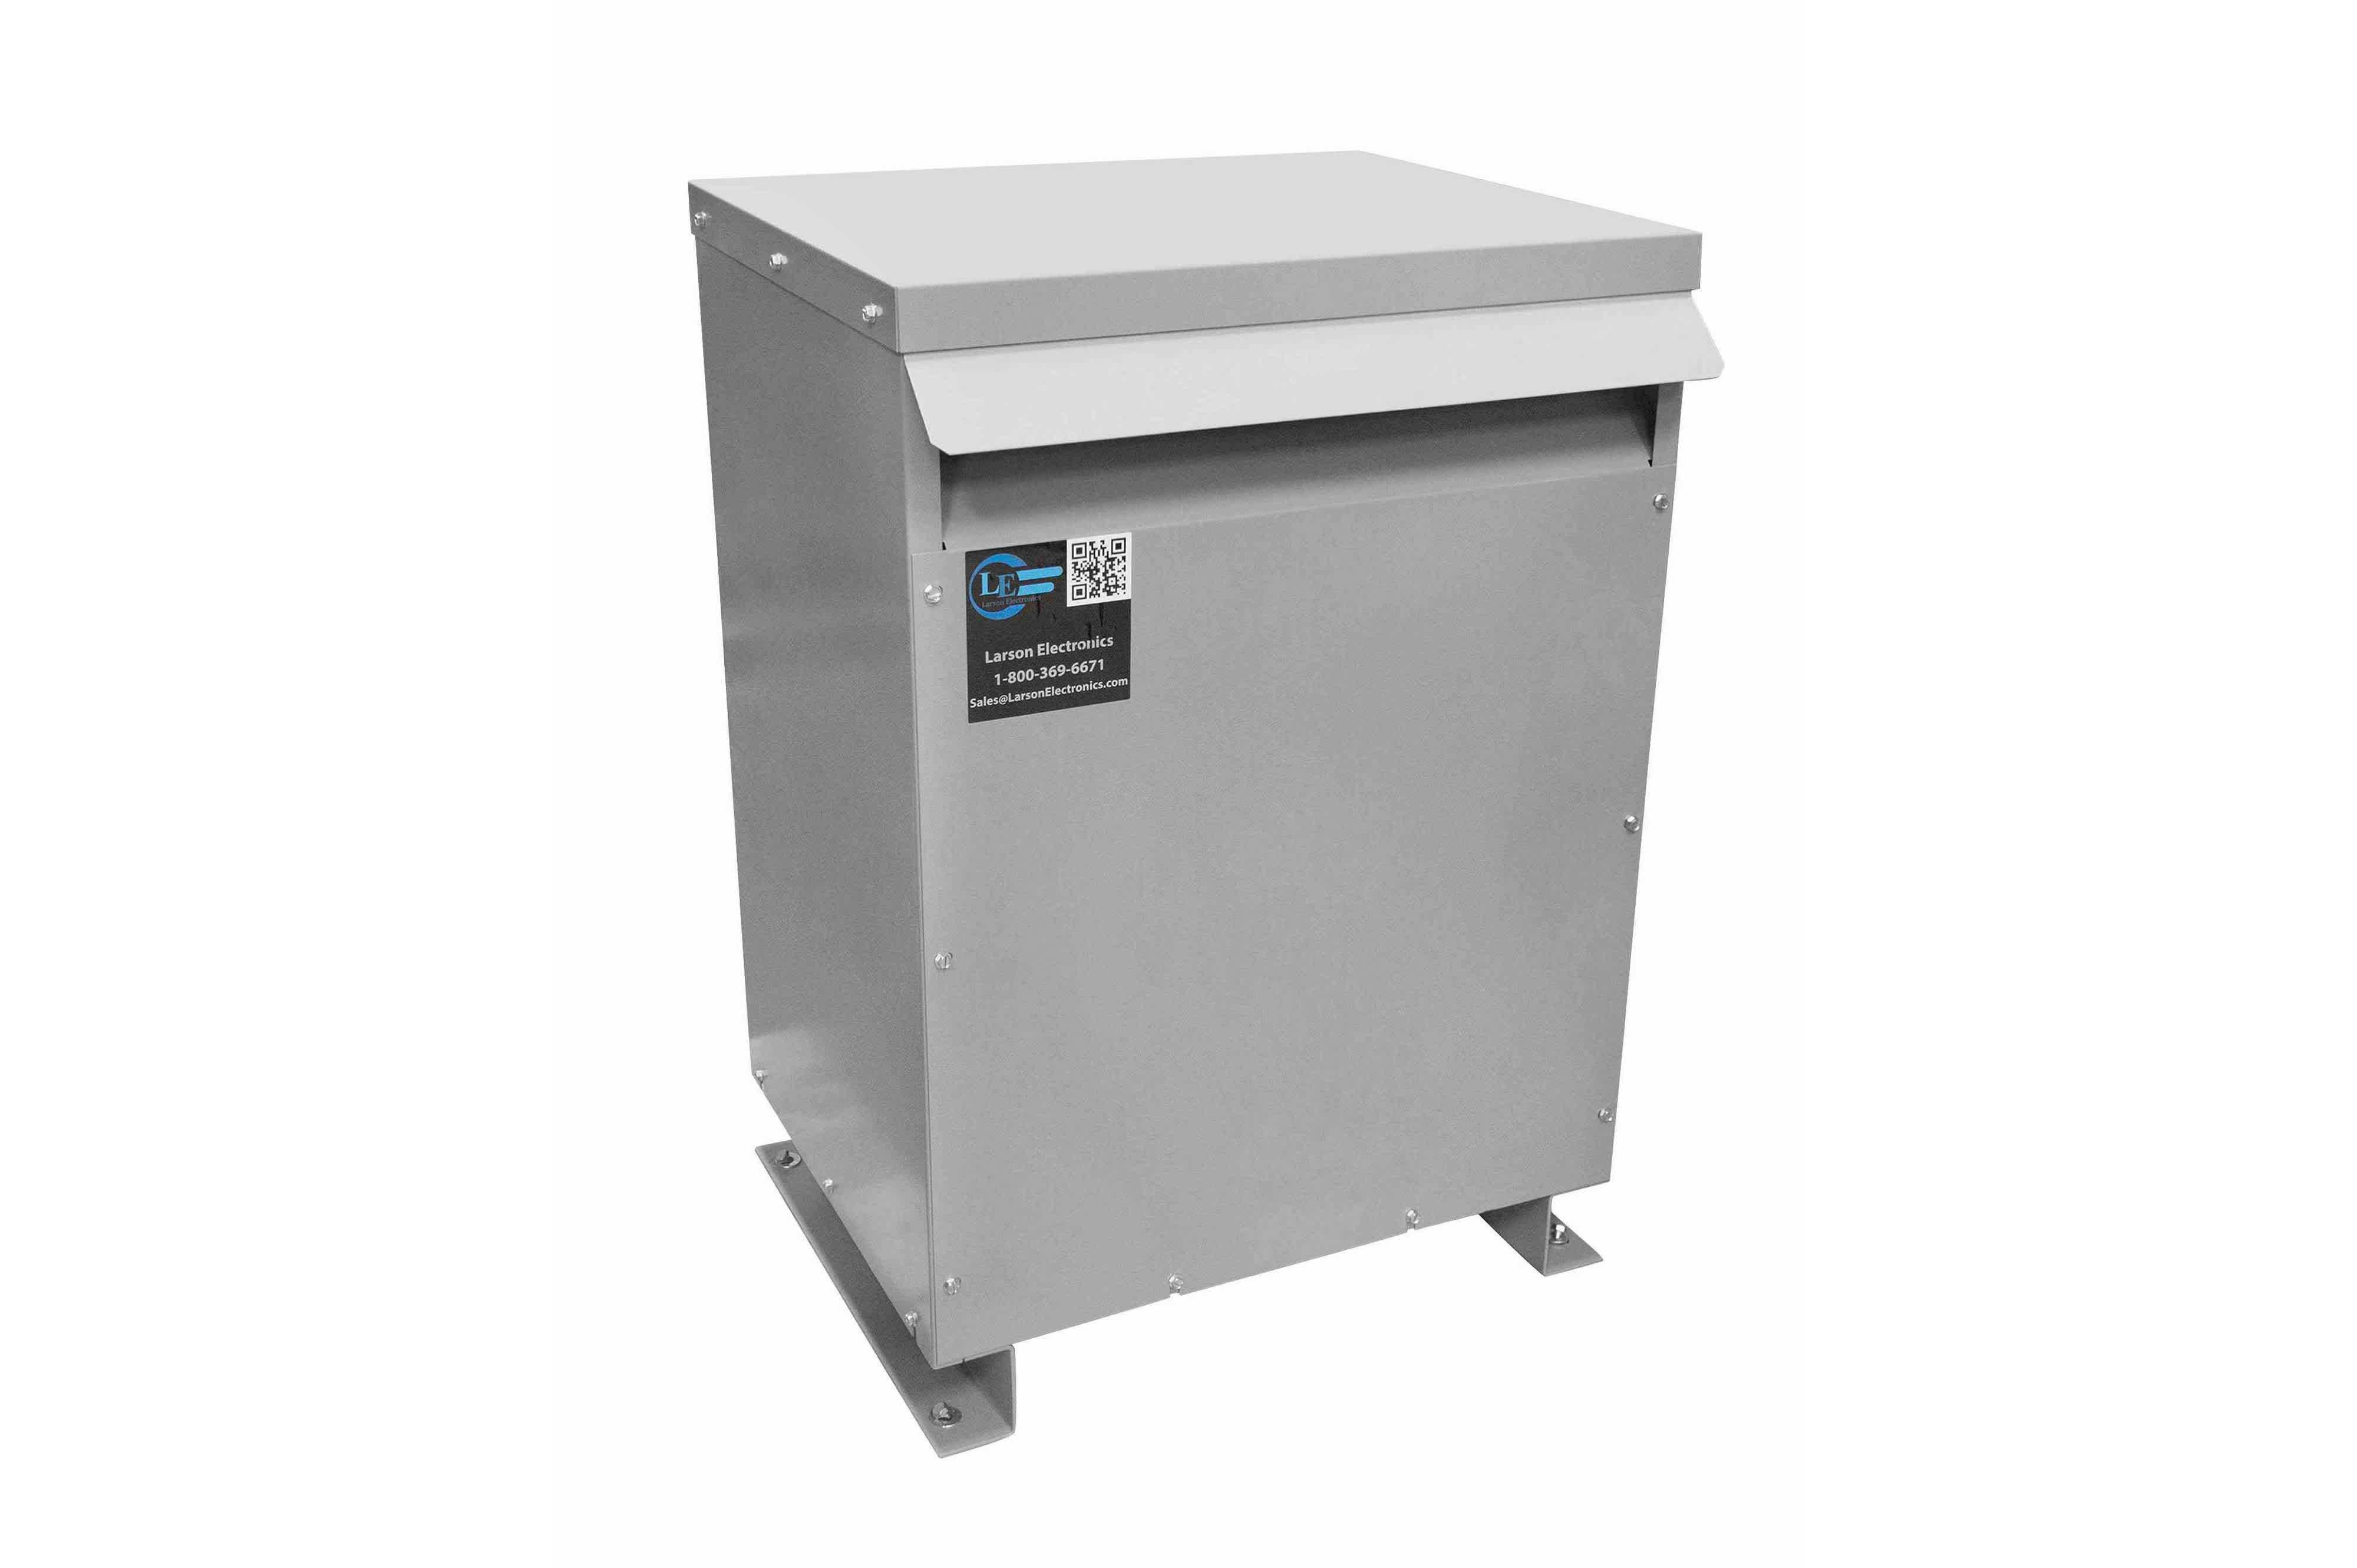 12 kVA 3PH Isolation Transformer, 480V Wye Primary, 400Y/231 Wye-N Secondary, N3R, Ventilated, 60 Hz